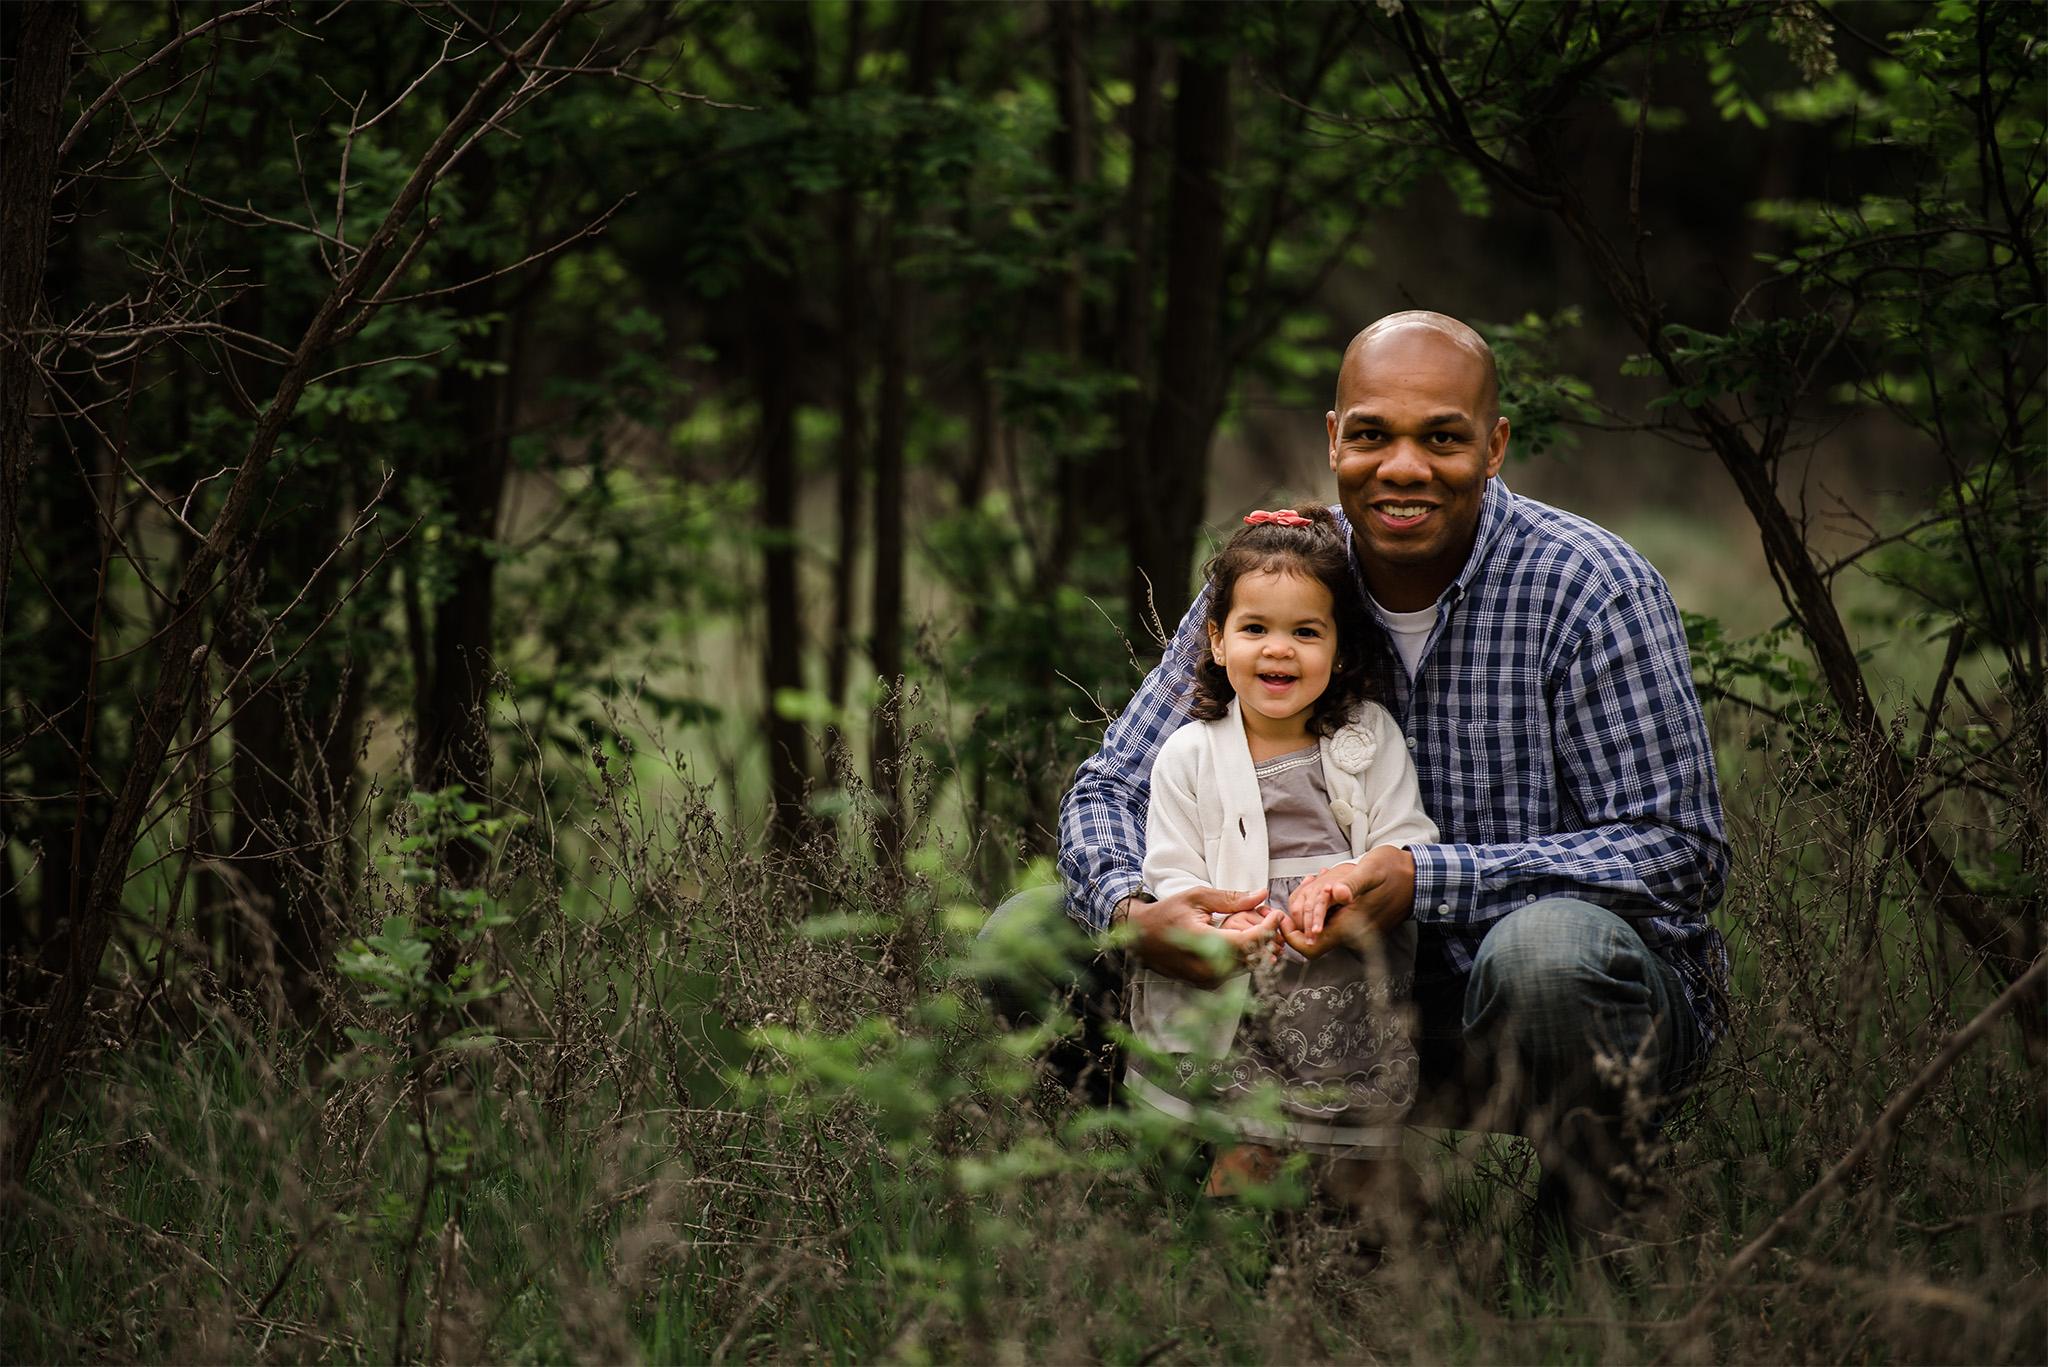 spokane_family_photographer_family_posing_2